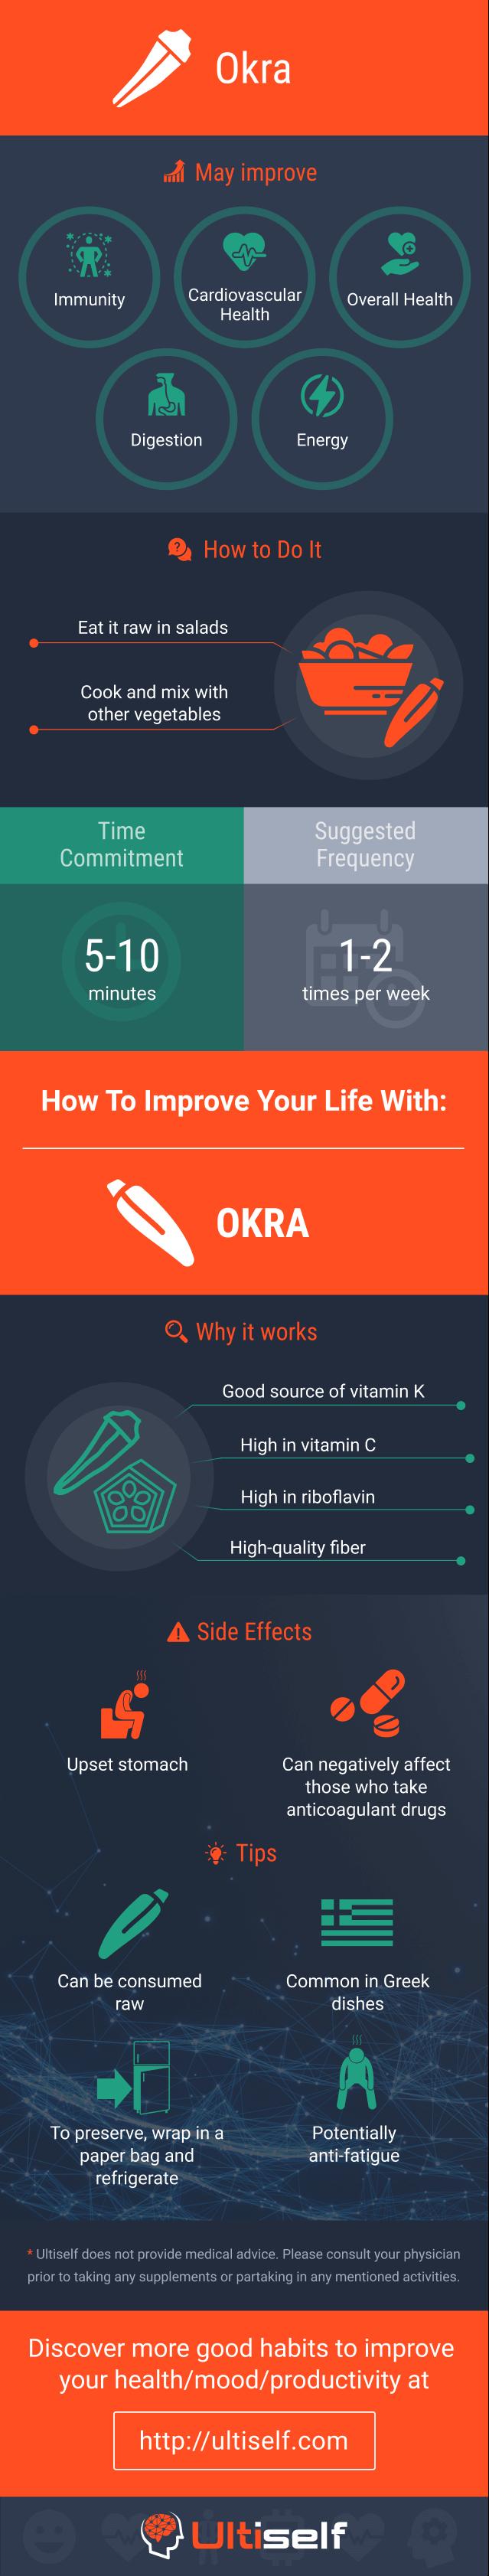 Okra infographic